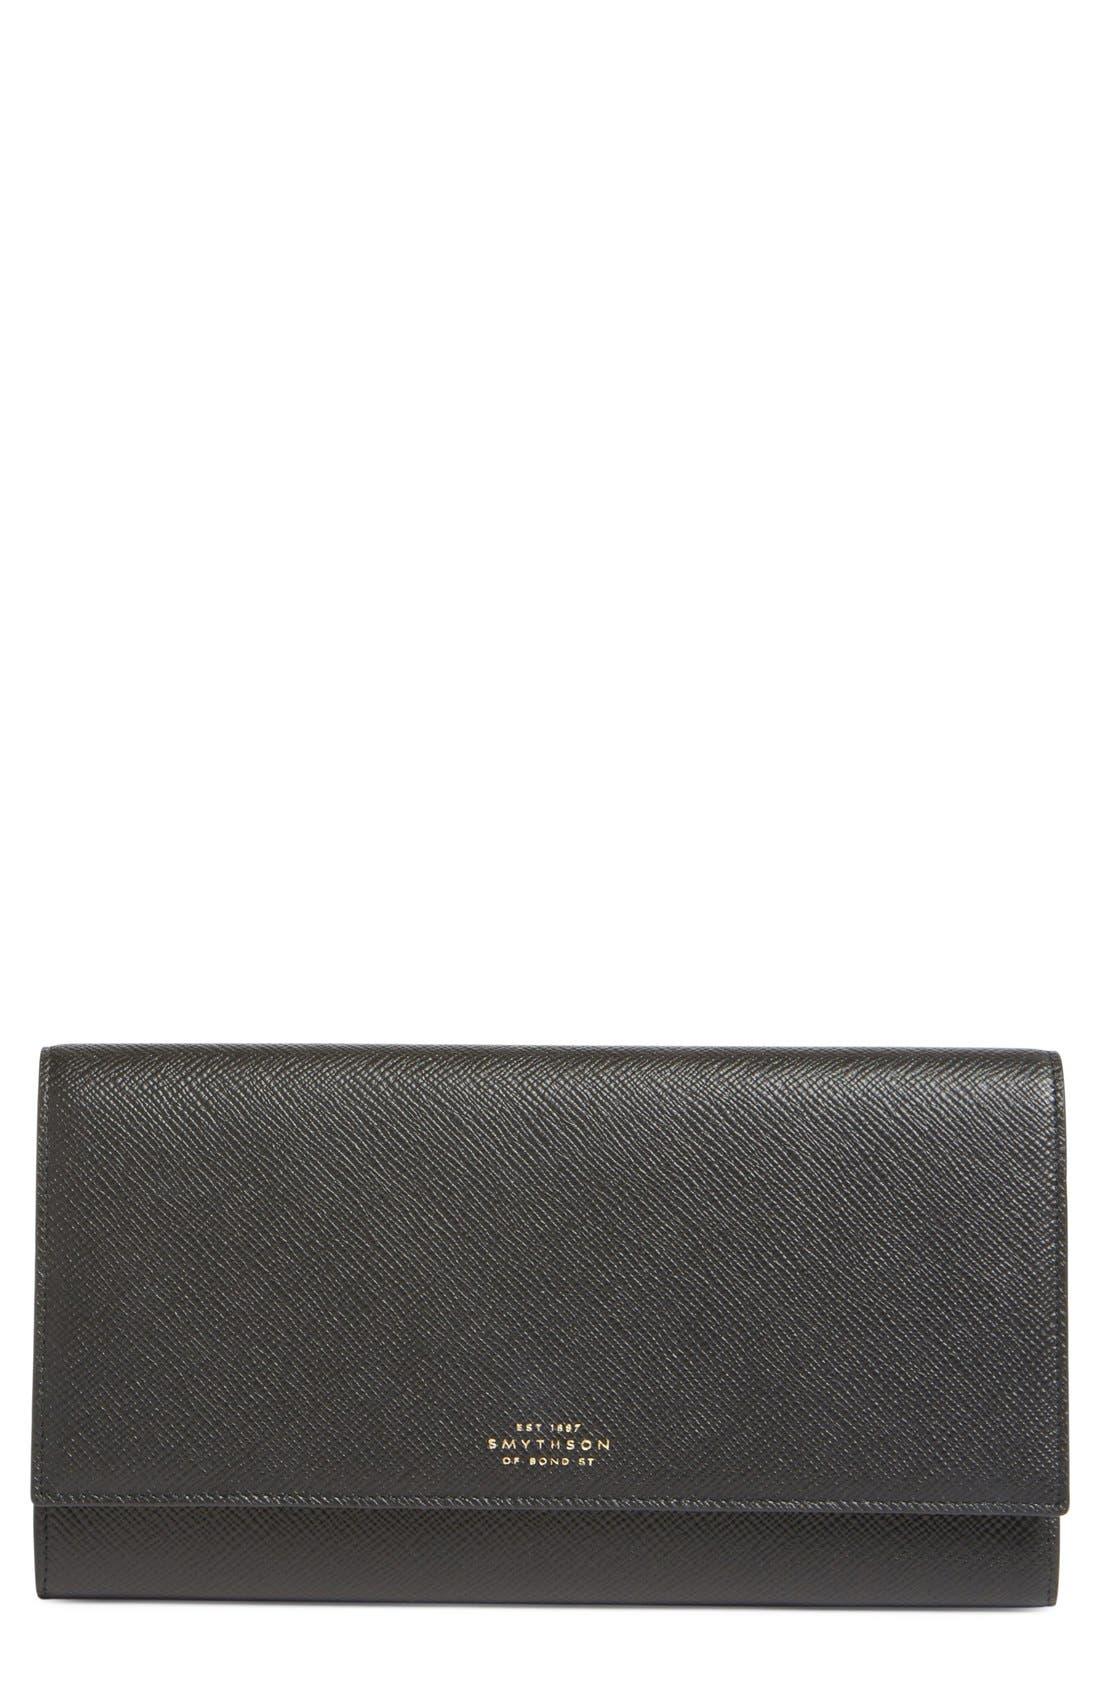 'Panama Marshall' Travel Wallet,                         Main,                         color, 001